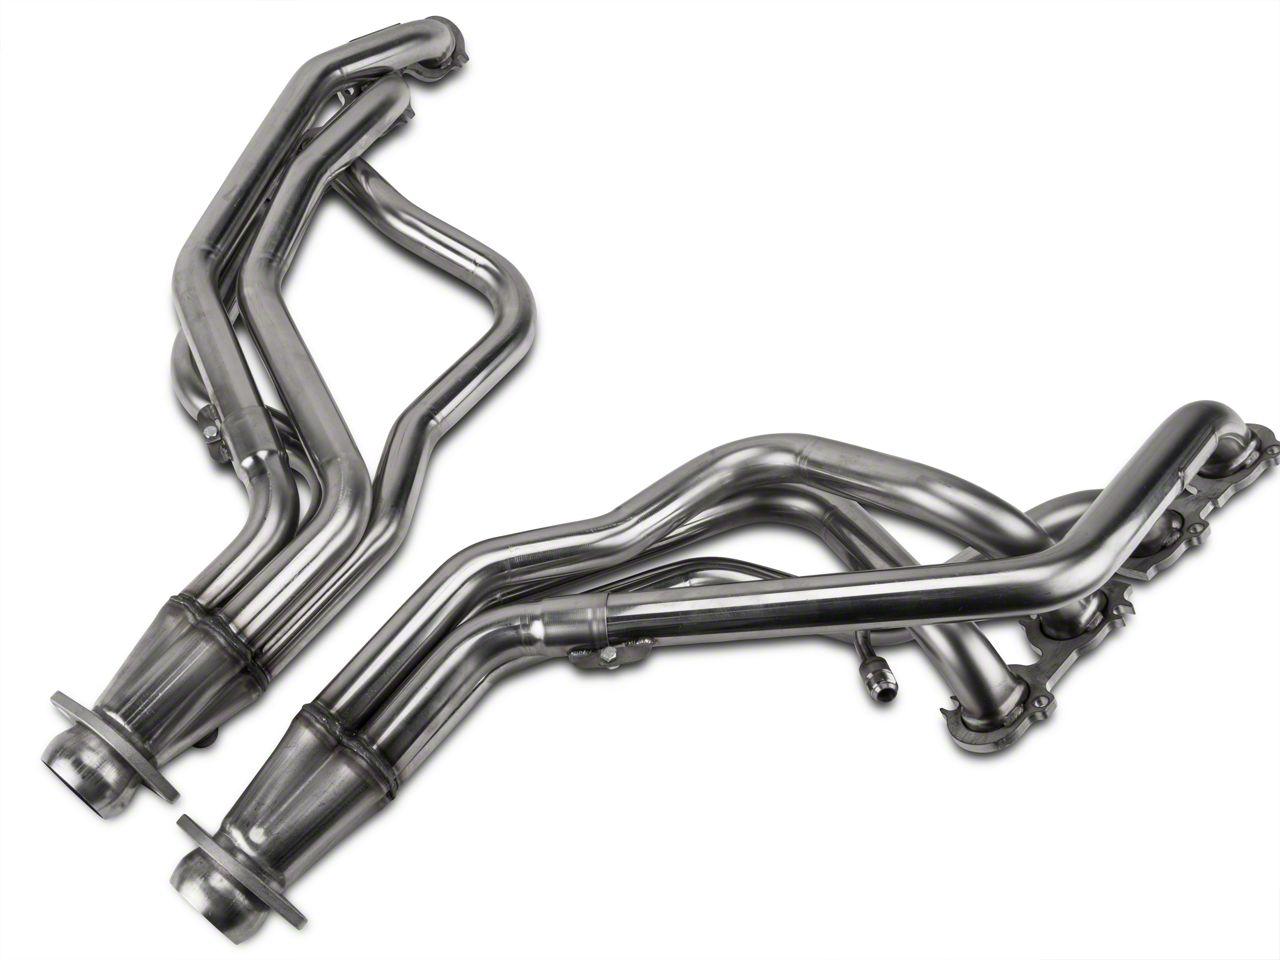 Kooks 1-5/8 in. Long Tube Headers (96-04 Cobra, Mach 1)